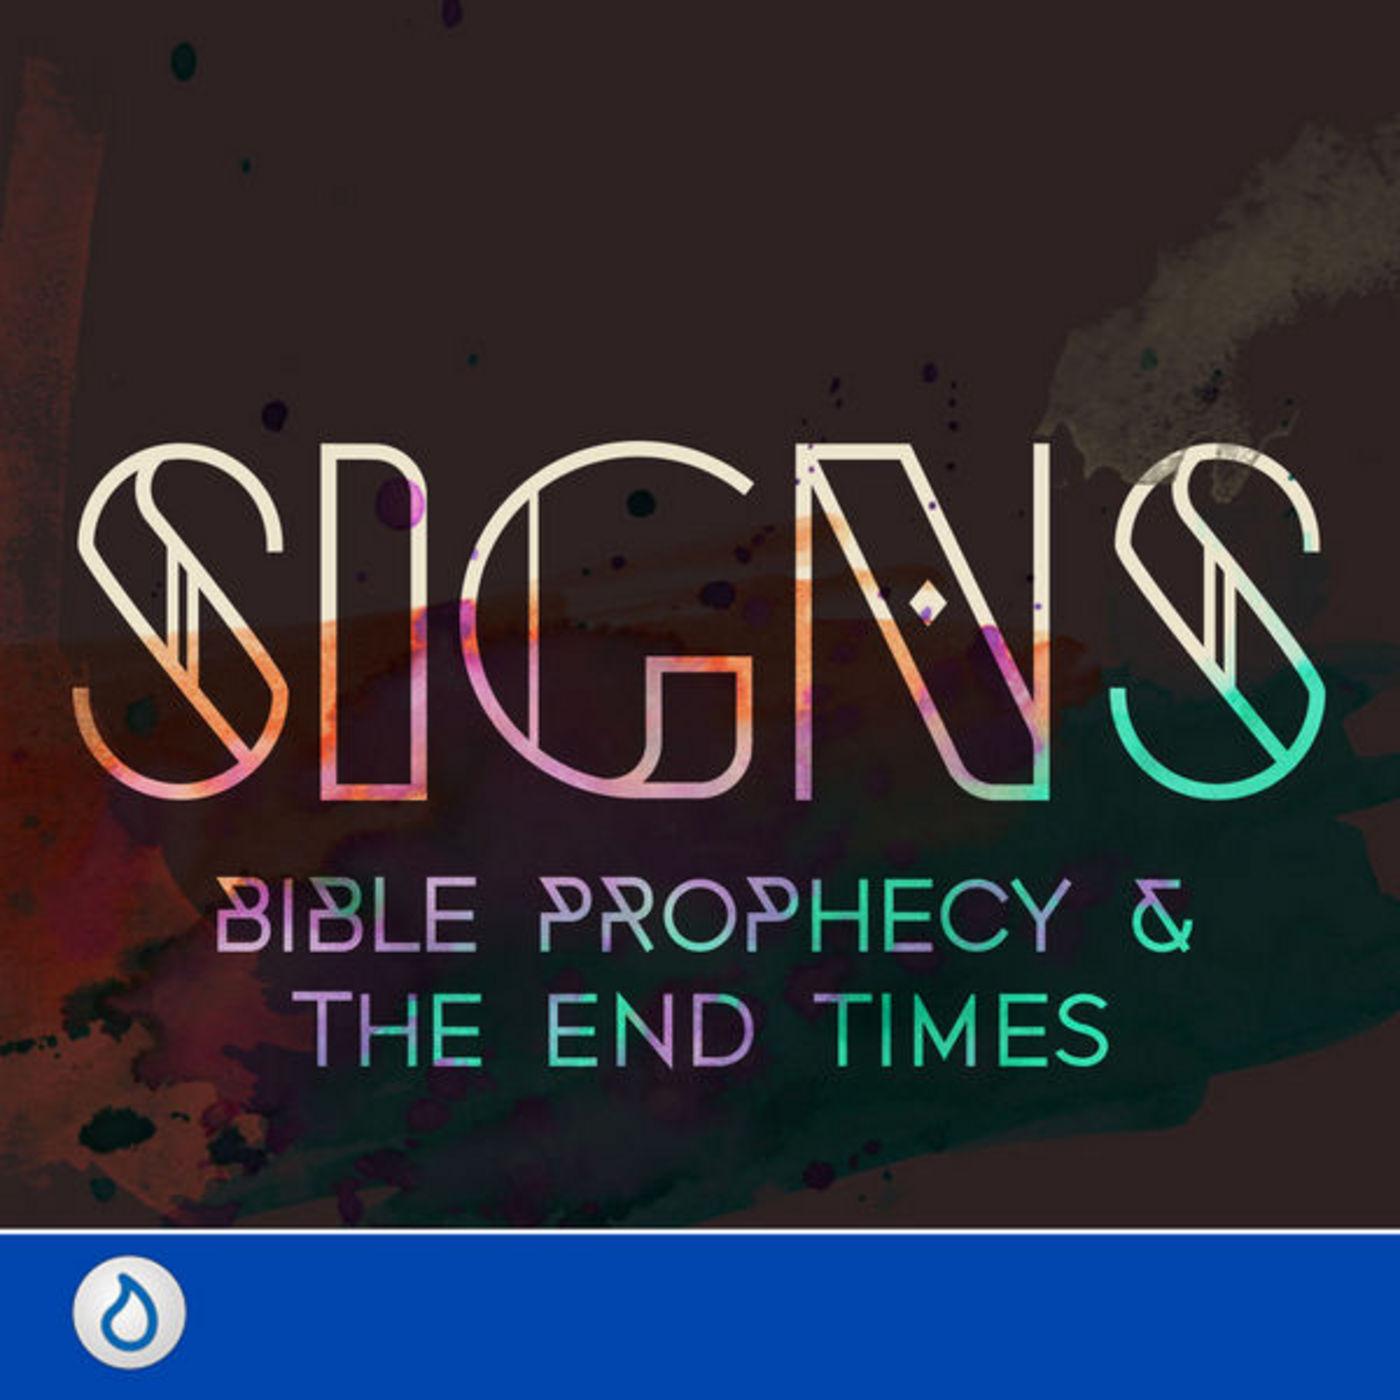 <![CDATA[Signs]]>